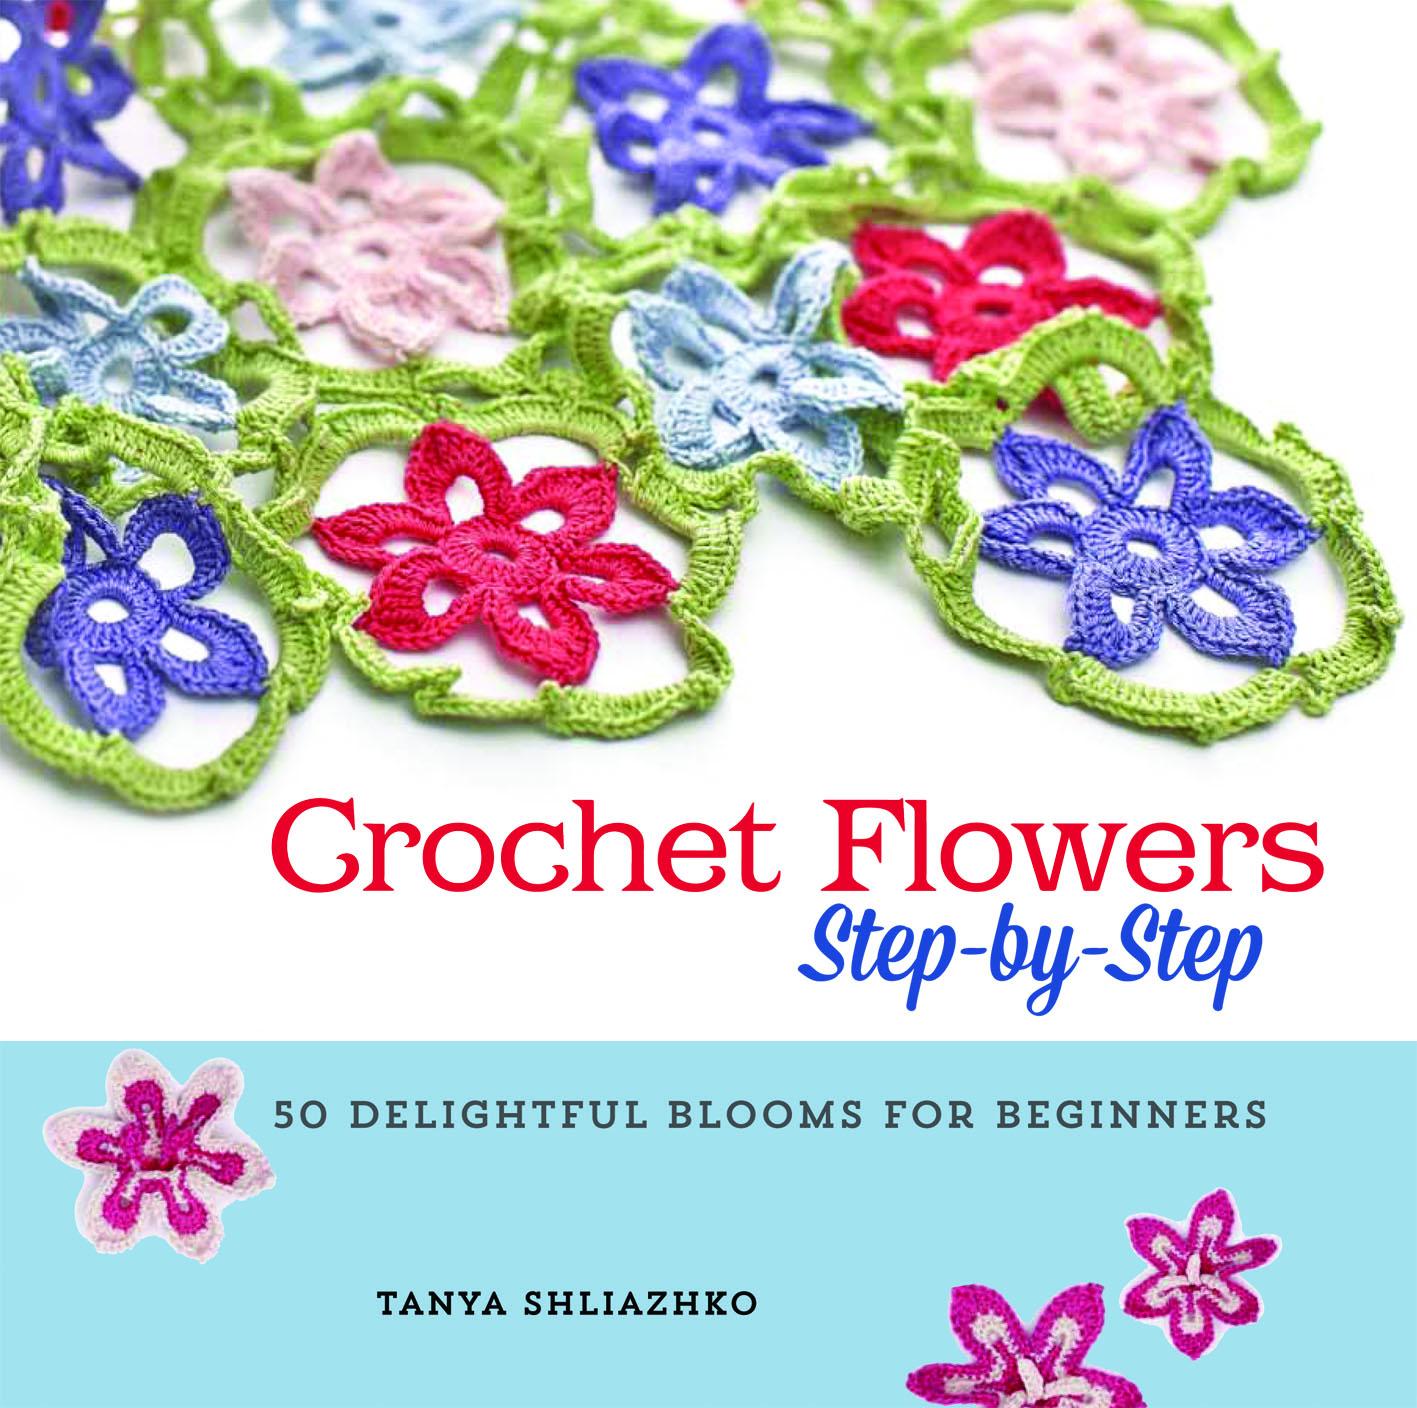 Crochet Flowers Step-by-Step by Shliazhko, Tanya Penguin ...